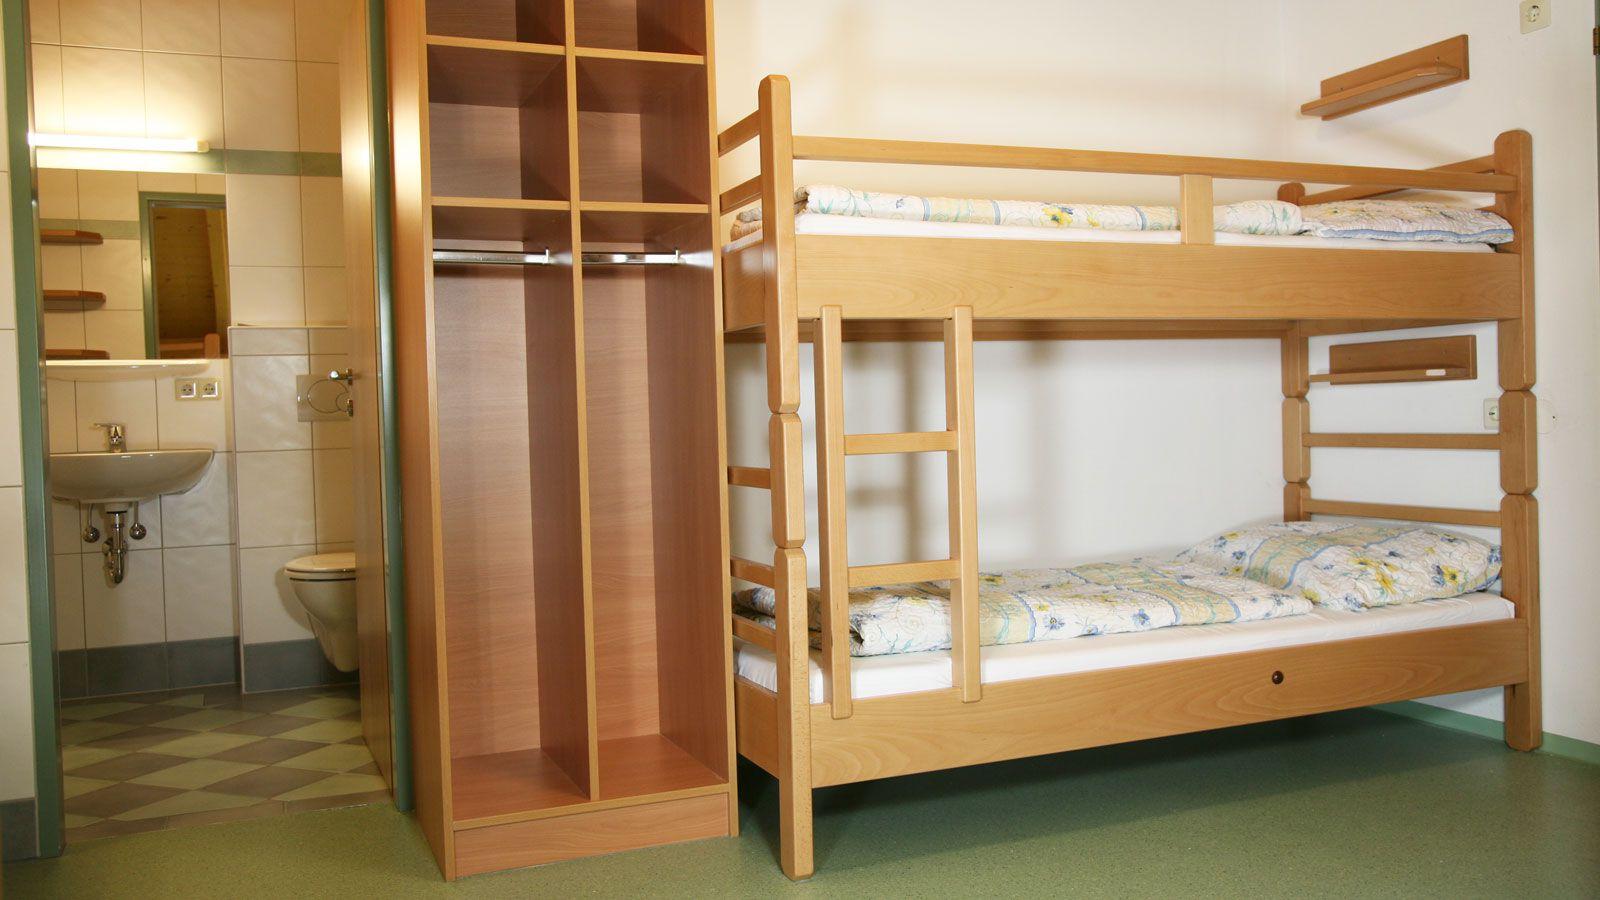 Jugendhotel Wiederkehr School Ski Trip Accommodation : SS G Ski Austria Hotel Salzburger Sportwelt Jugenhotel Wiederkehr Bunk Room from www.pgl.co.uk size 1600 x 900 jpeg 148kB